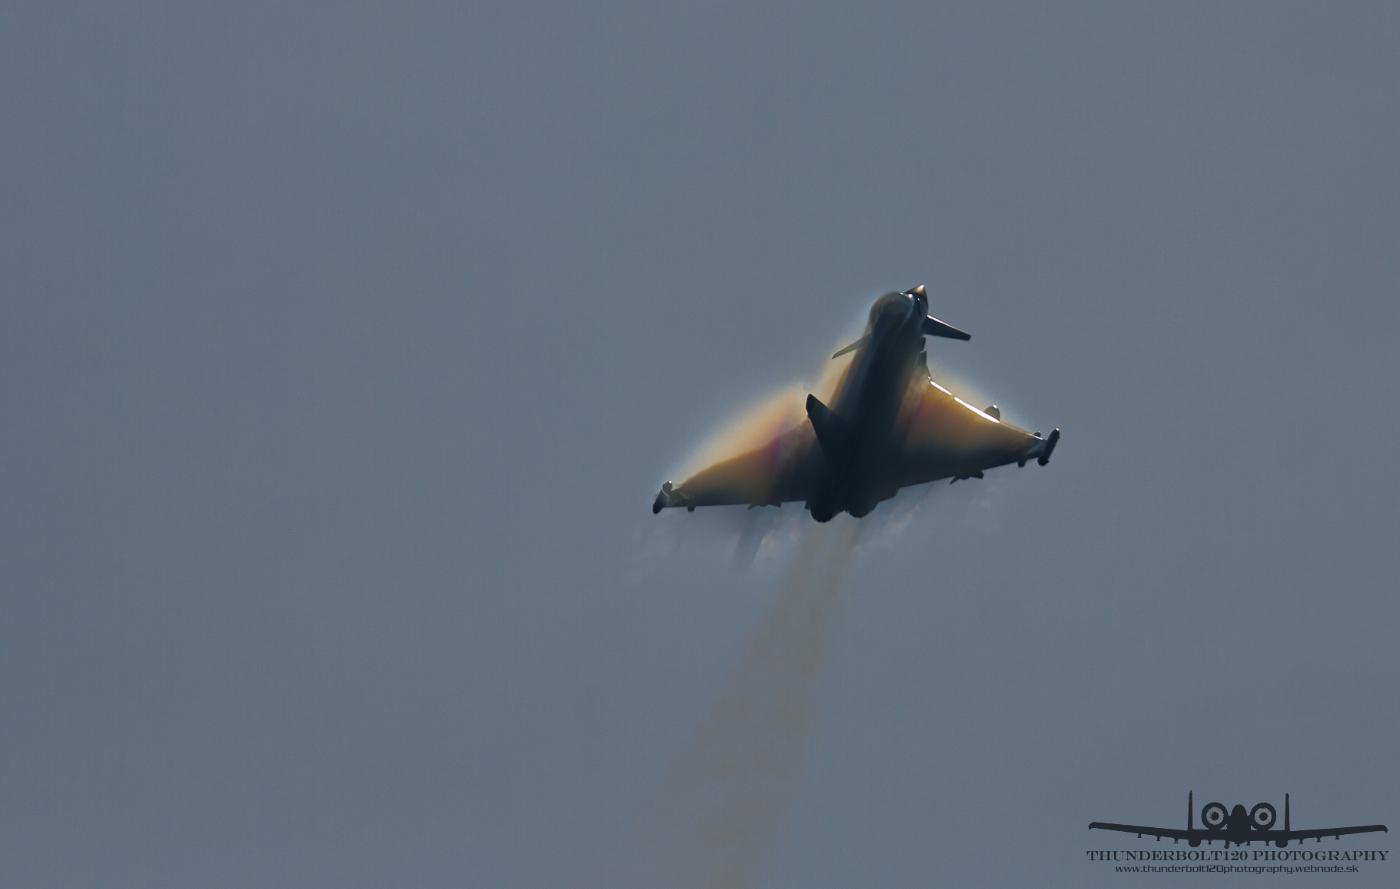 Eurofighter EF-2000 Typhoon S 7L-WG